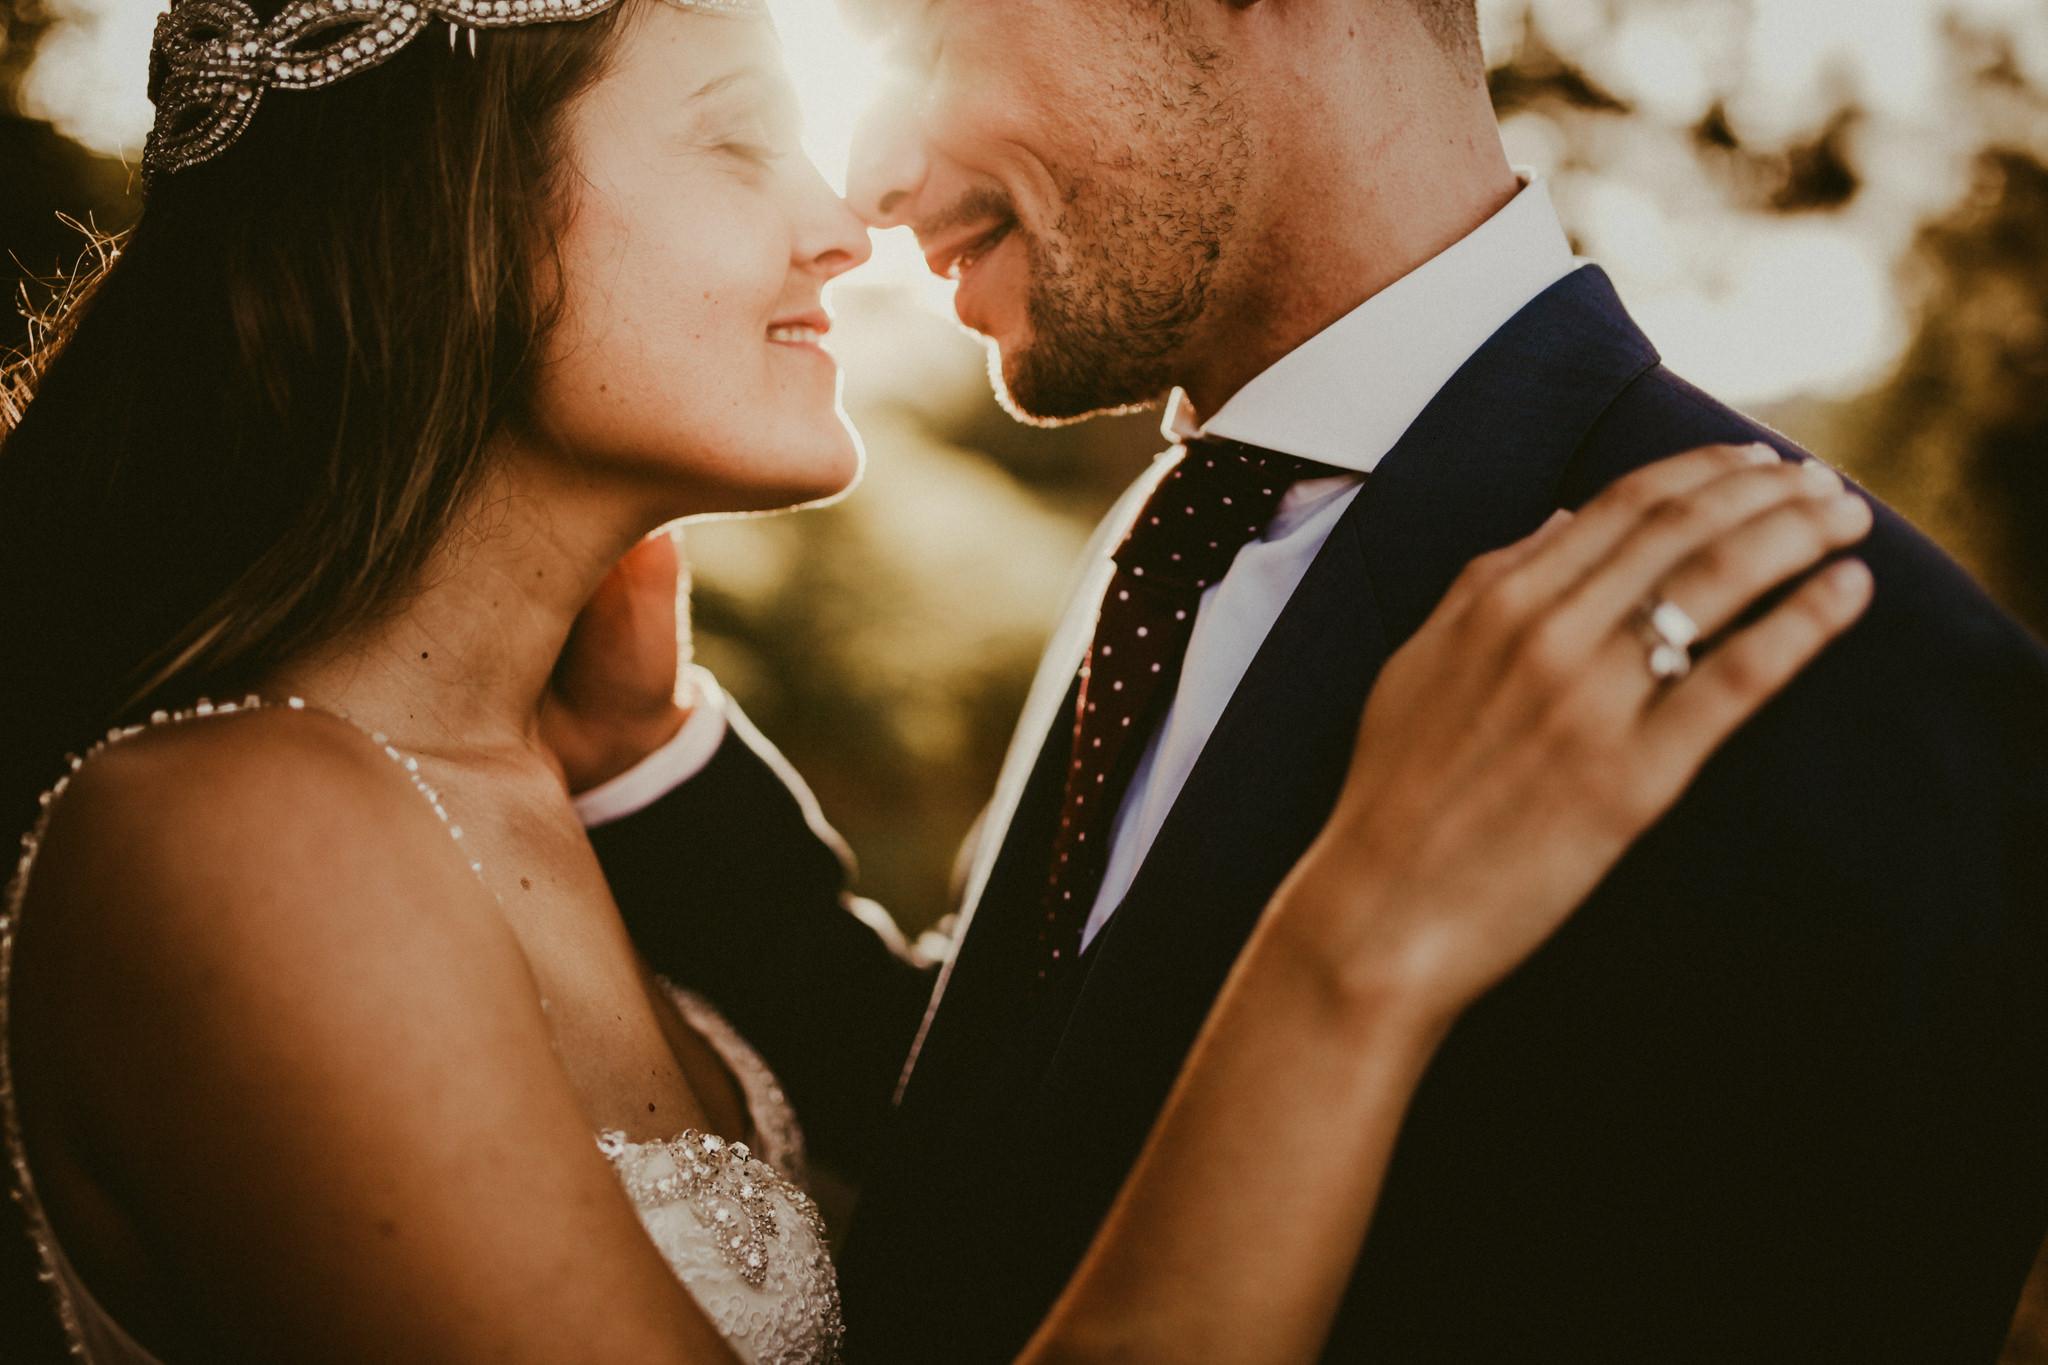 boda-diferente-fotografo-boda-laspalmas-grancanaria-67